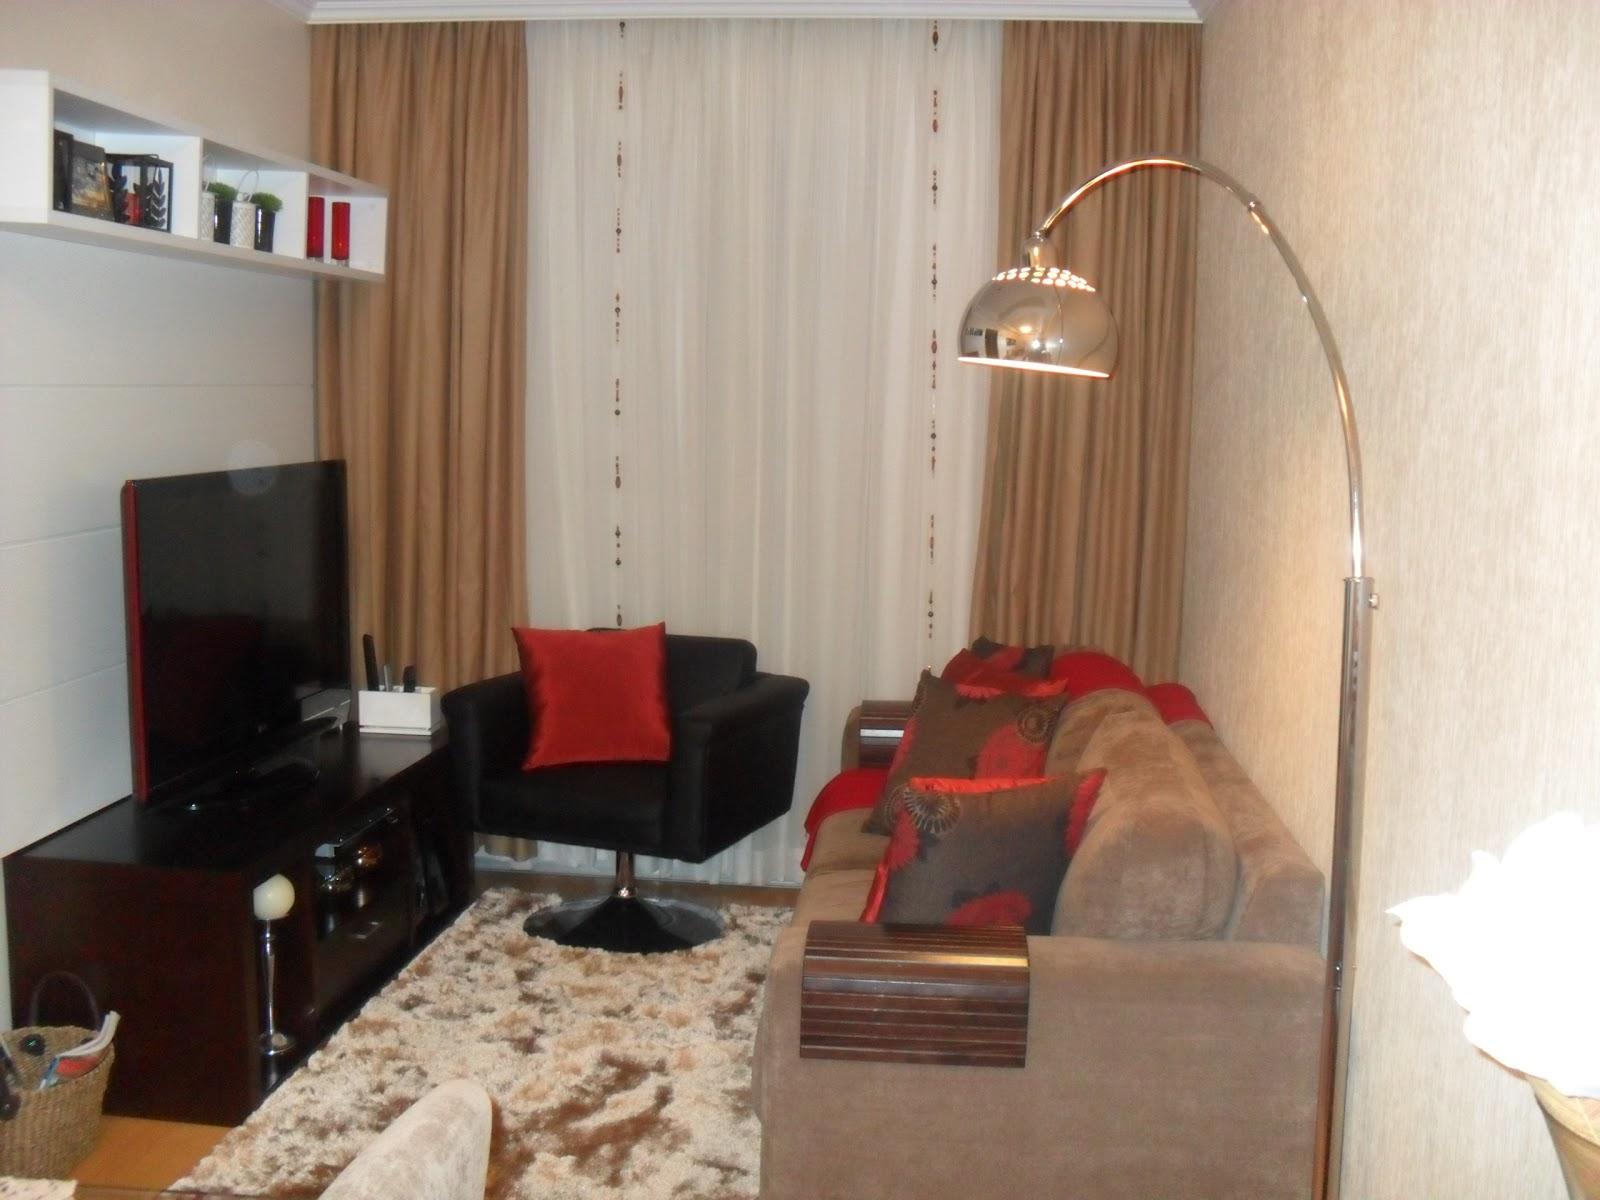 "decoracao interiores sala estar:Dalsira Decoração de Interiores"": Sala de estar."